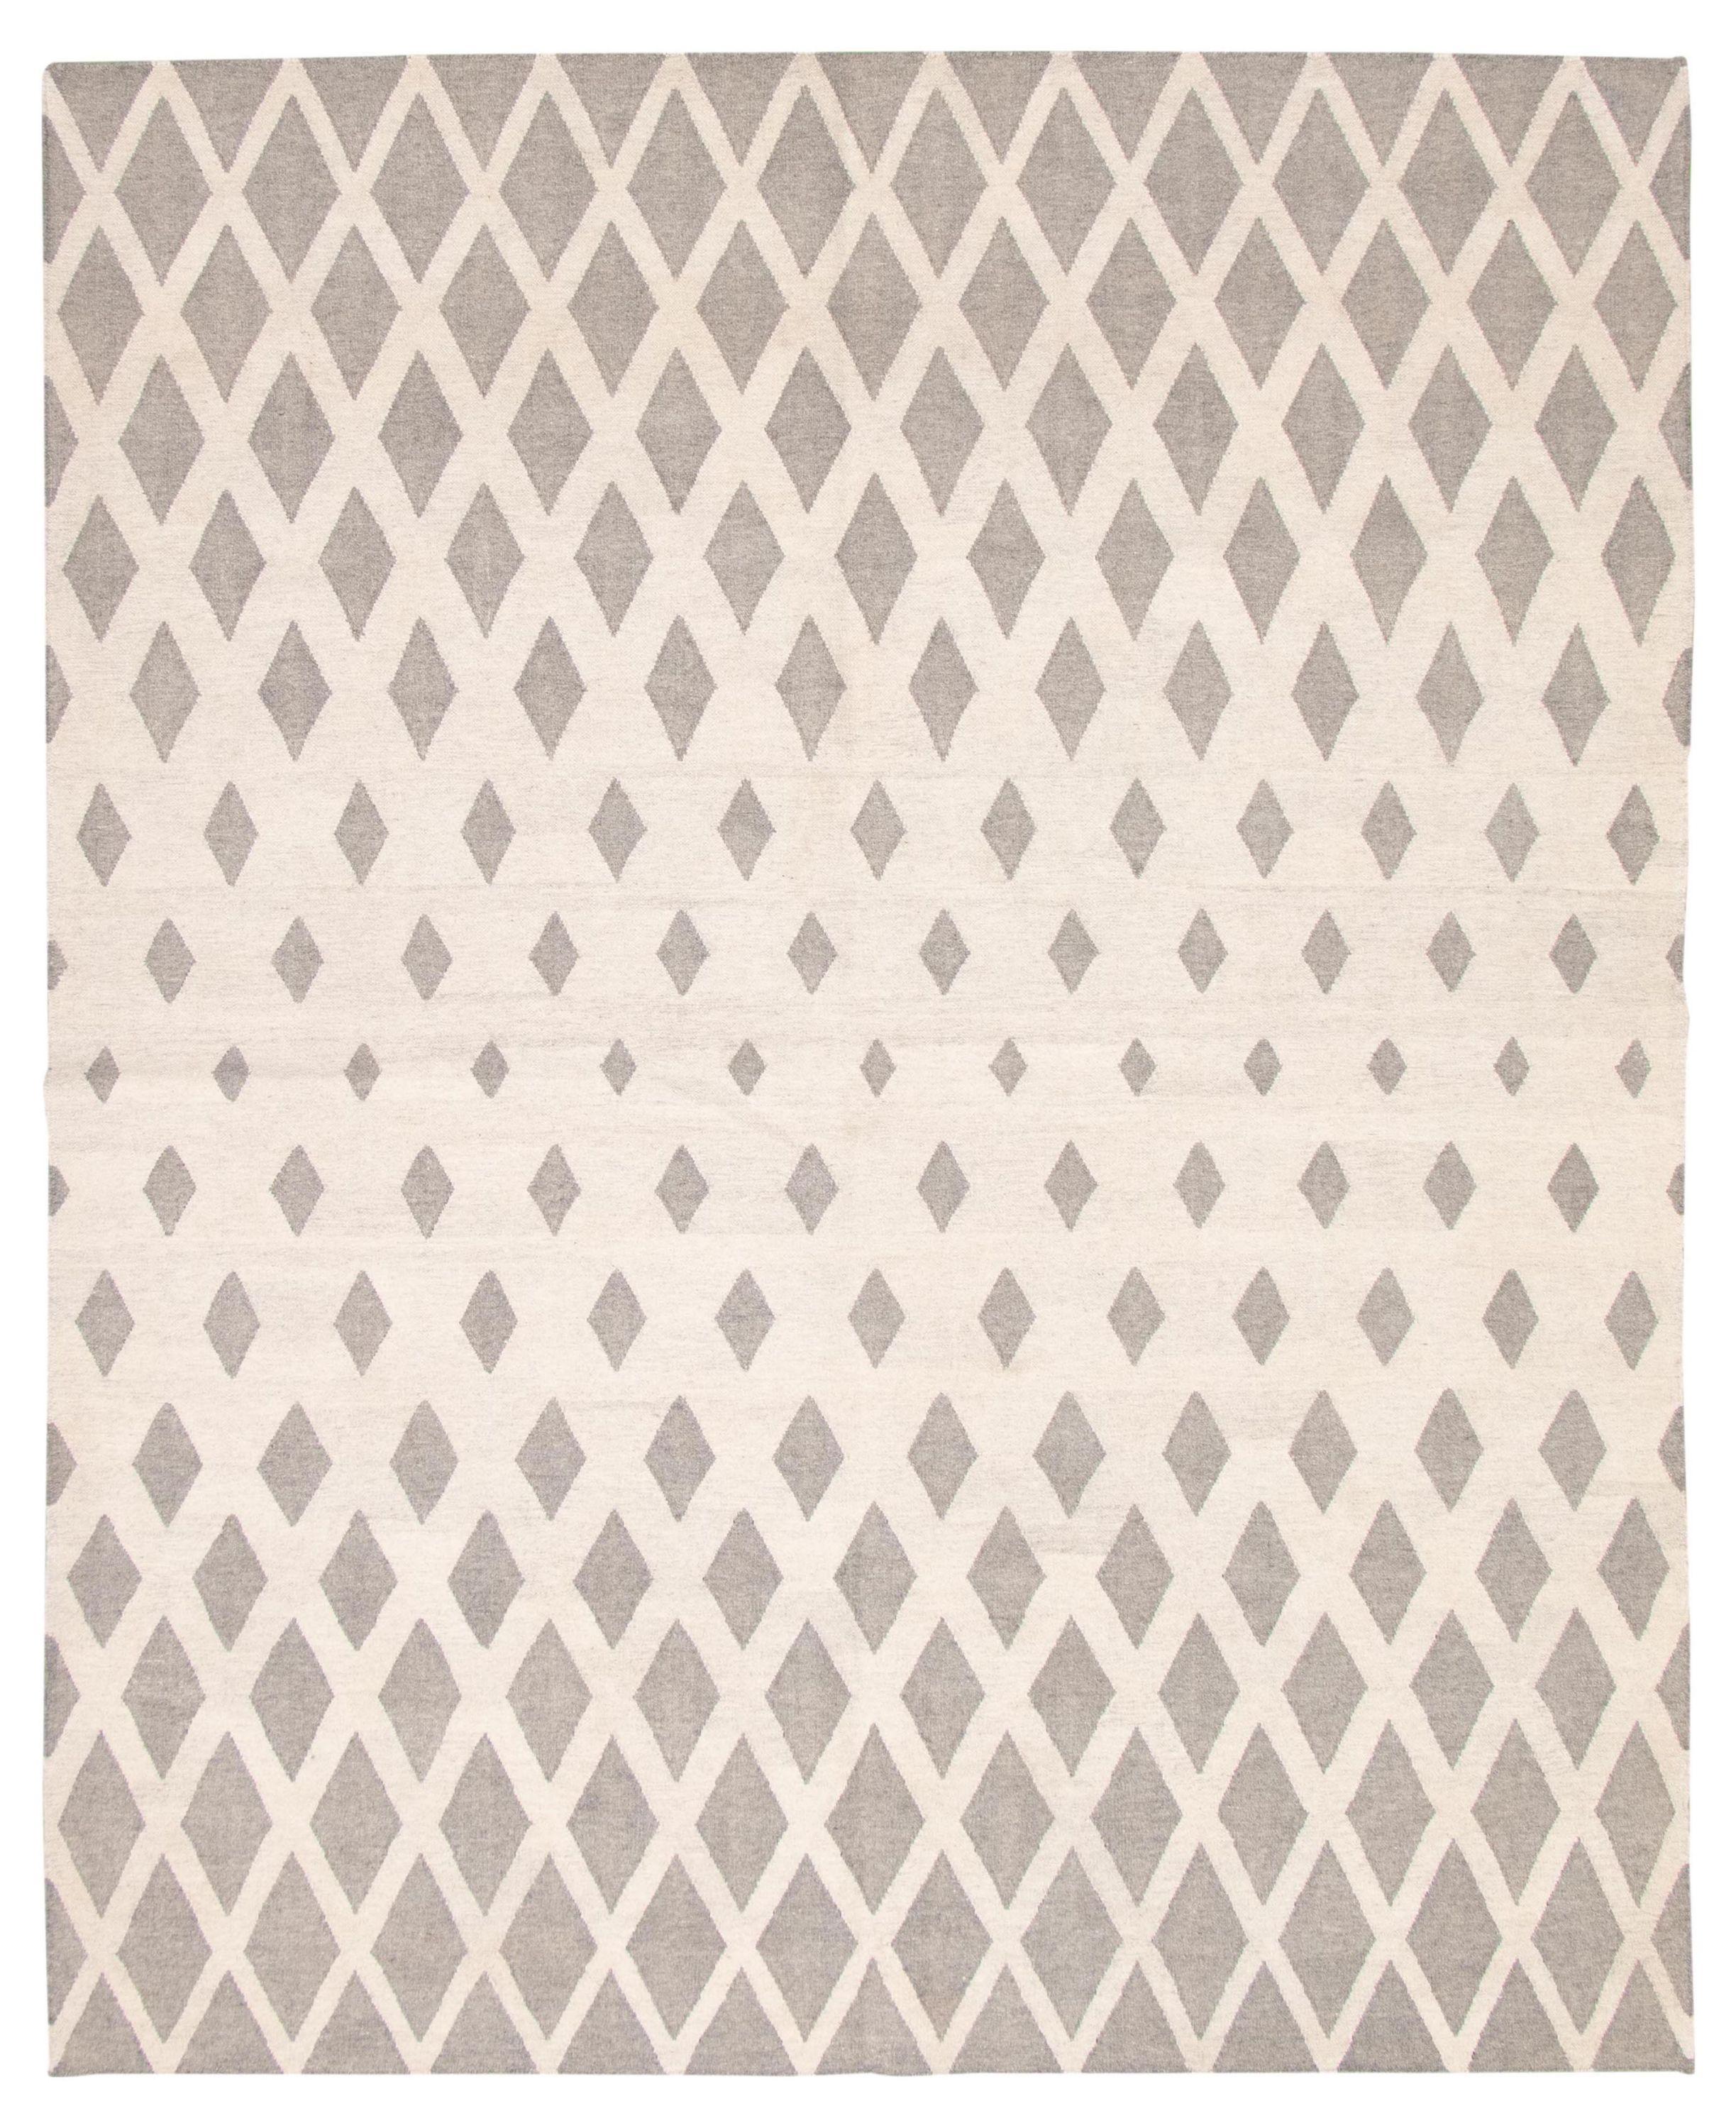 "Hand woven Ankara FW Cream, Grey Wool Kilim 8'1"" x 10'0"" Size: 8'1"" x 10'0"""